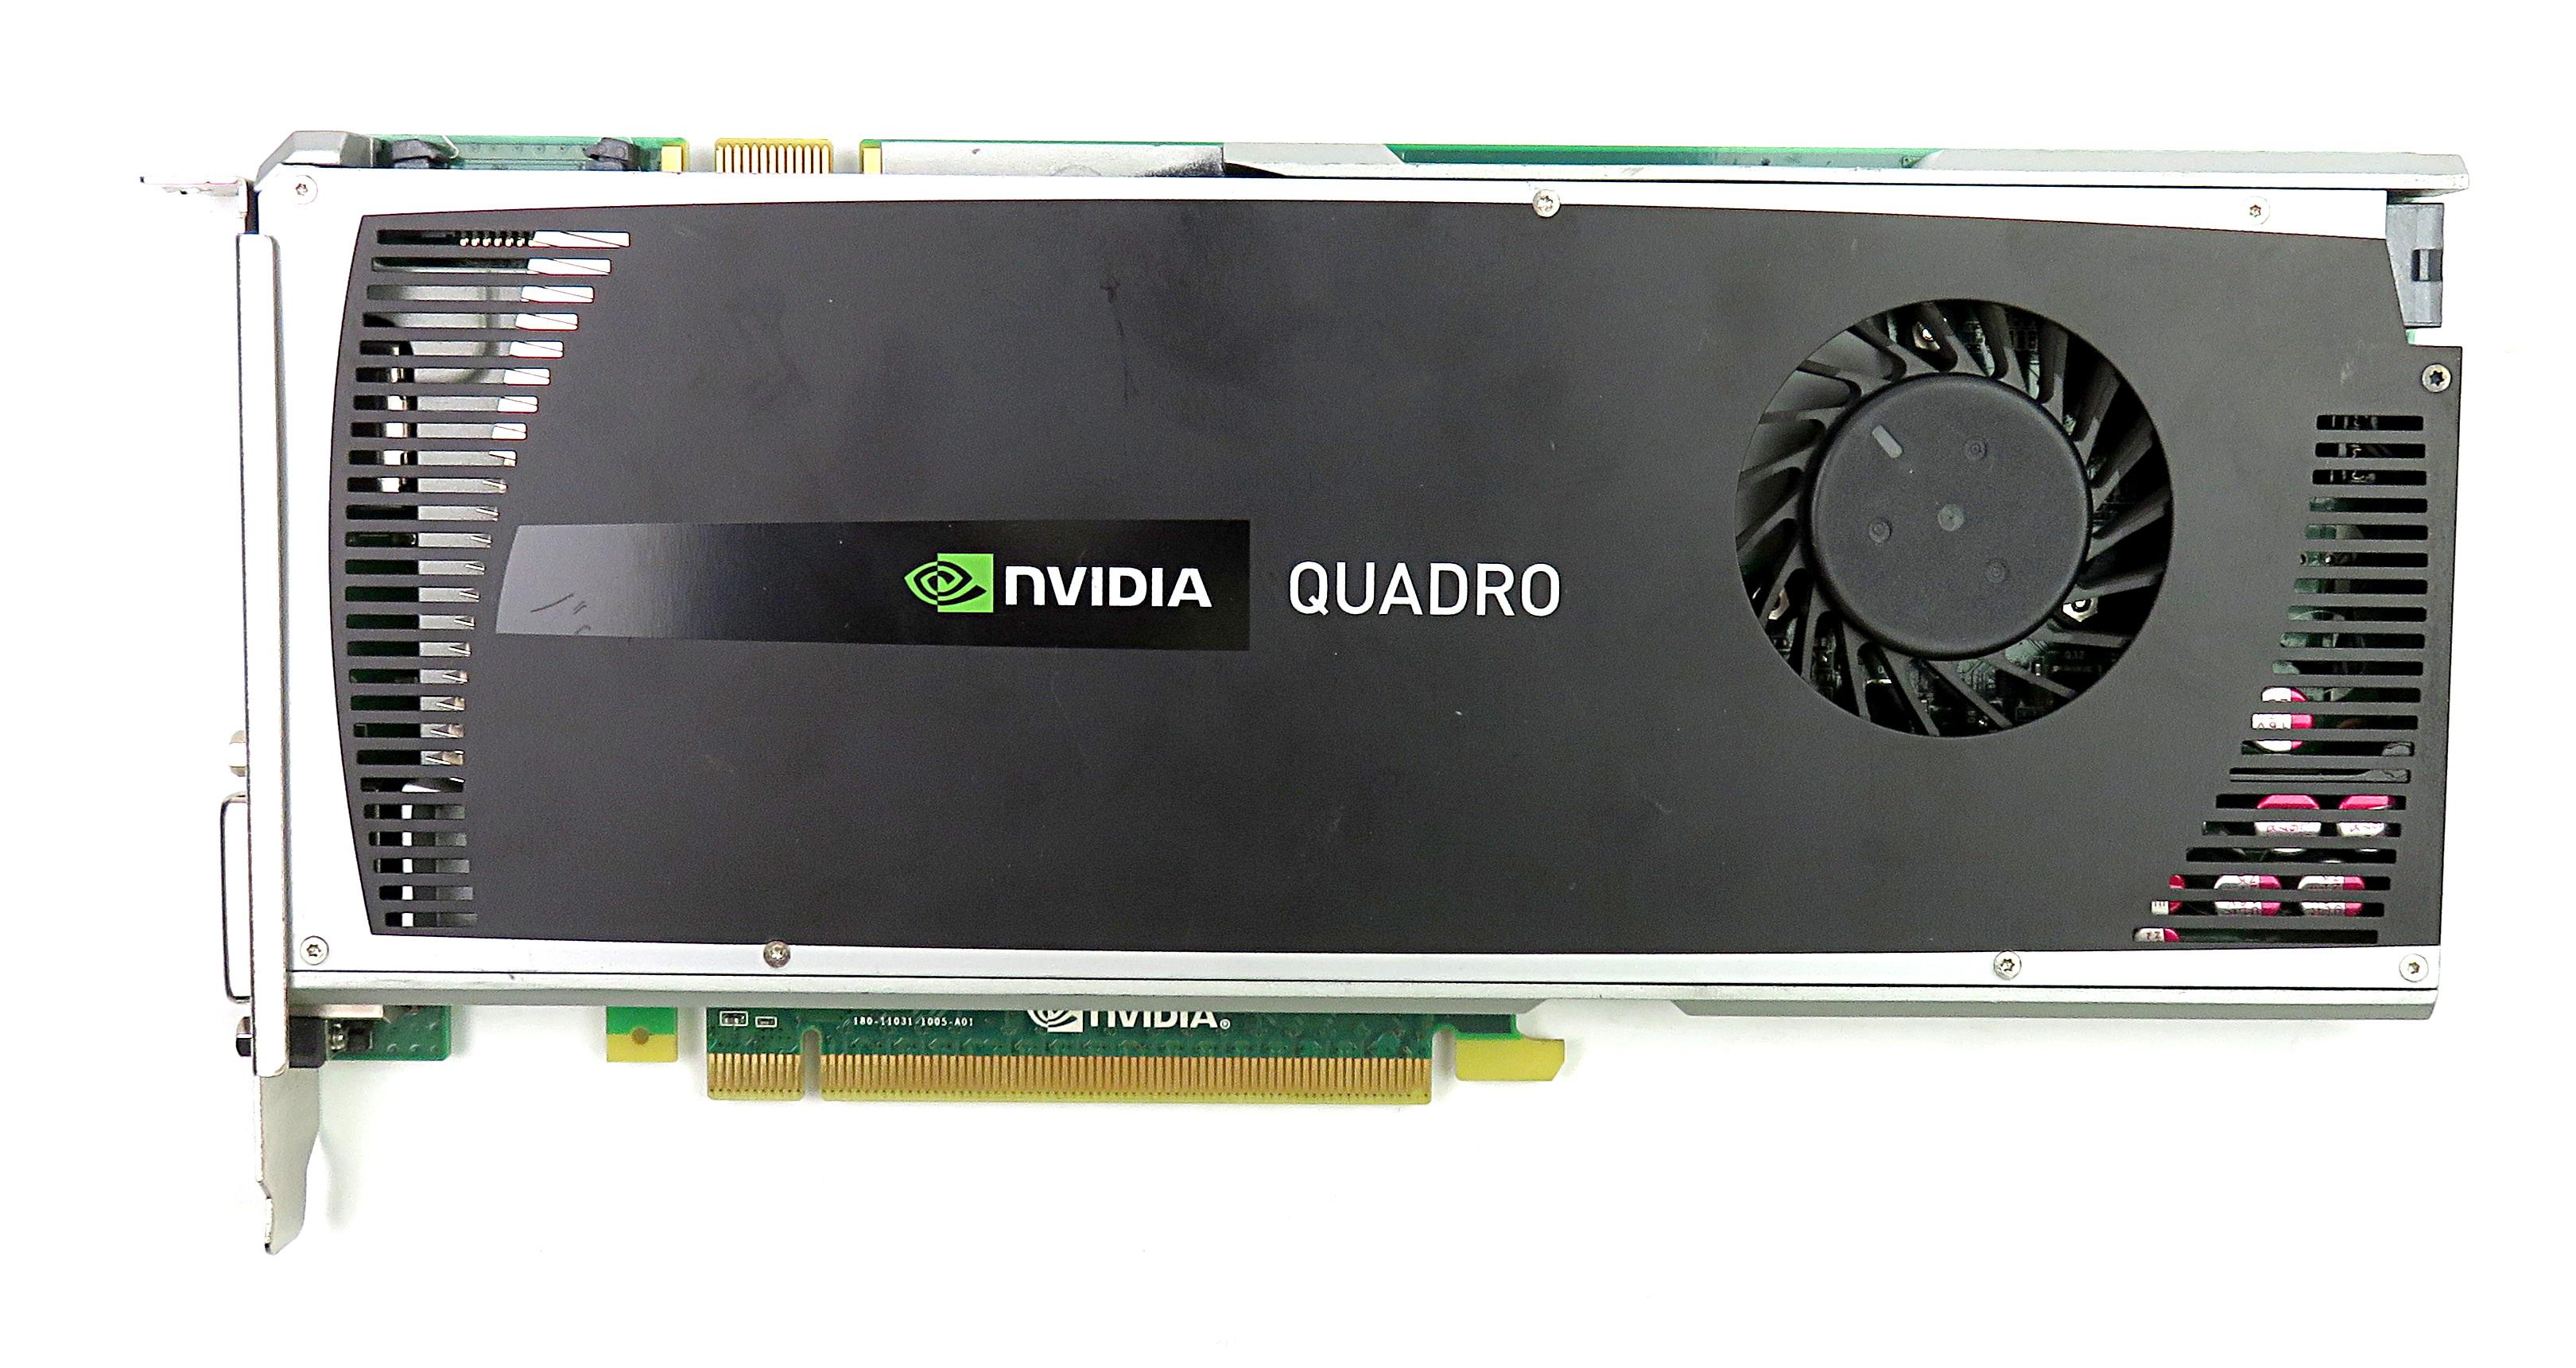 PNY nVidia Quadro 4000 for Mac 2GB GDDR5 Graphics Card VCQ4000MAC-T DP/DVI/ST